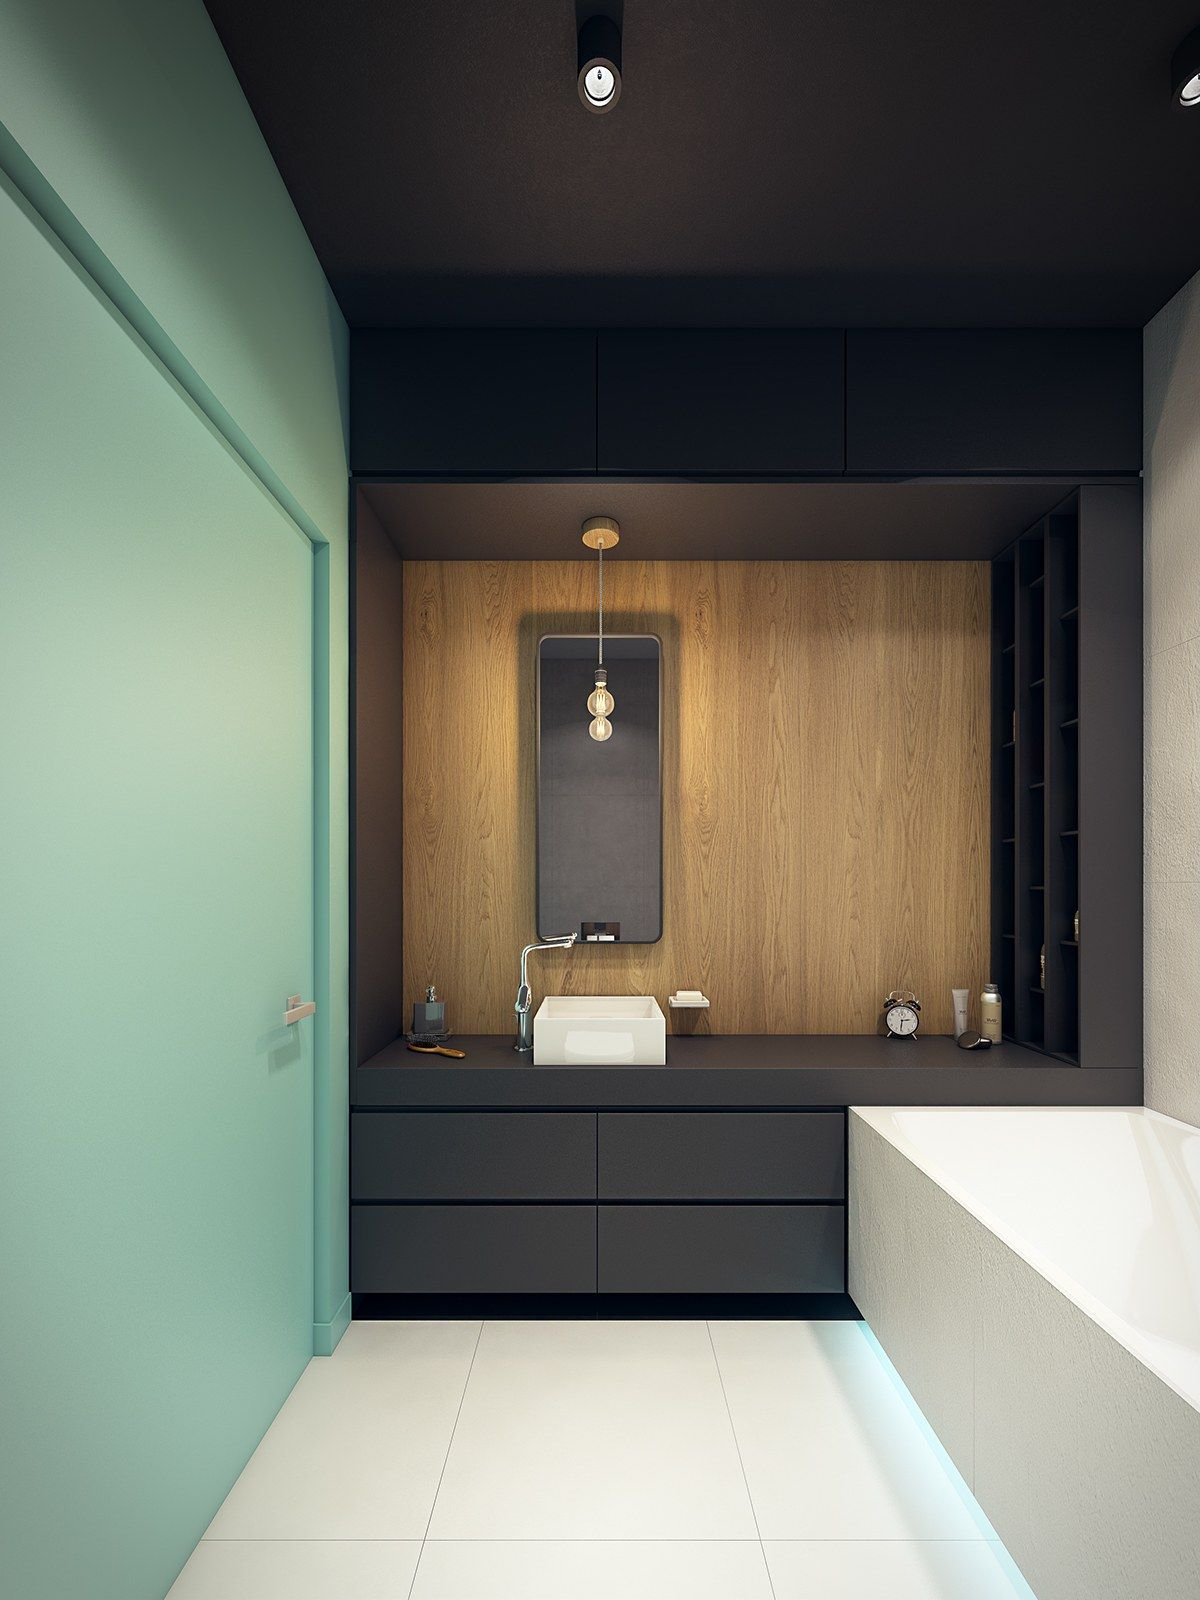 This Contemporary Apartment Pops With Turquoise Accents Bathroom  ~ Aplicaciones De Diseño De Interiores